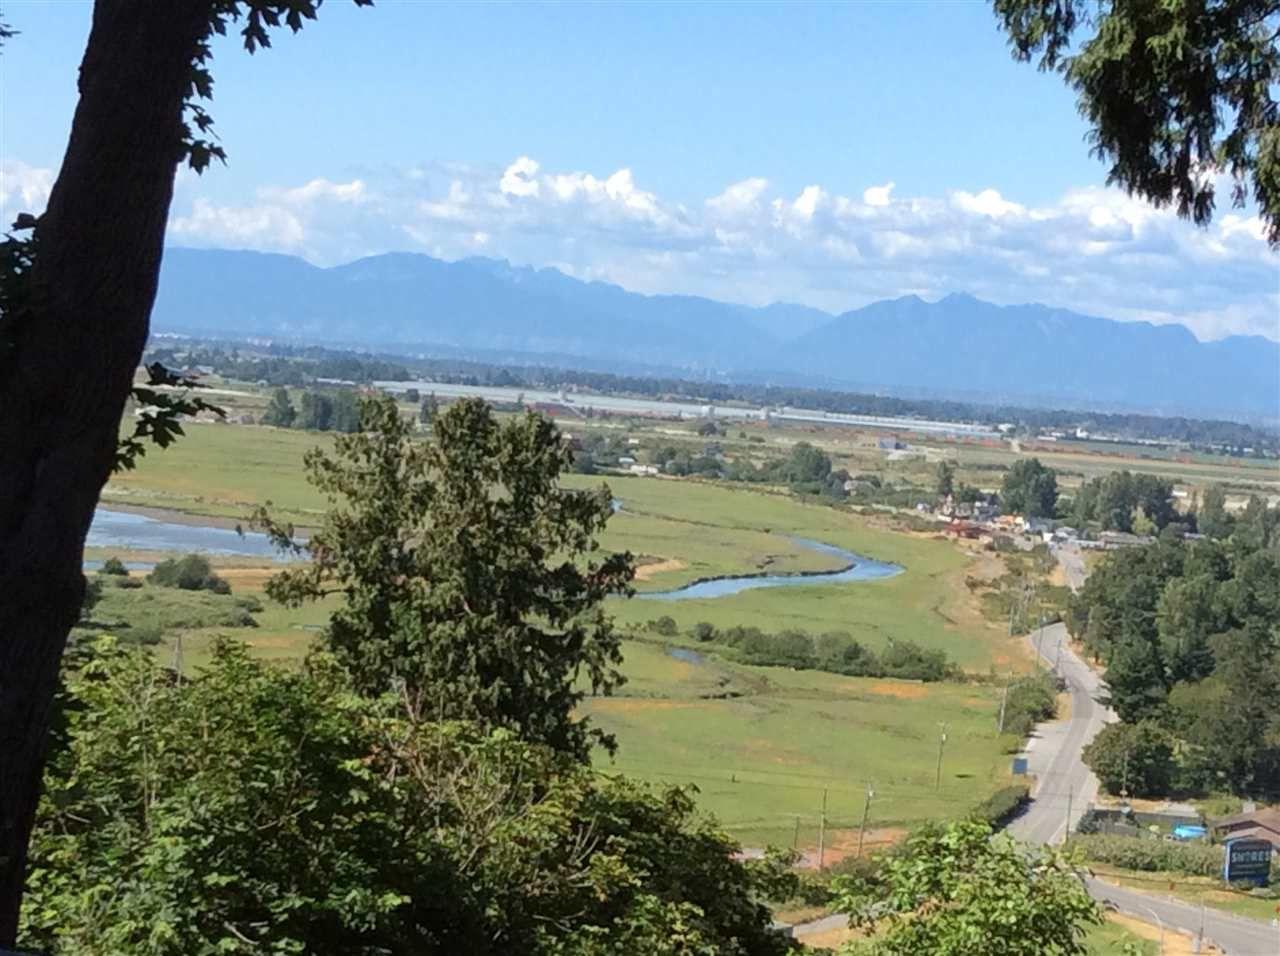 Main Photo: 1217 PACIFIC Drive in Tsawwassen: Tsawwassen Central House for sale : MLS®# R2122531